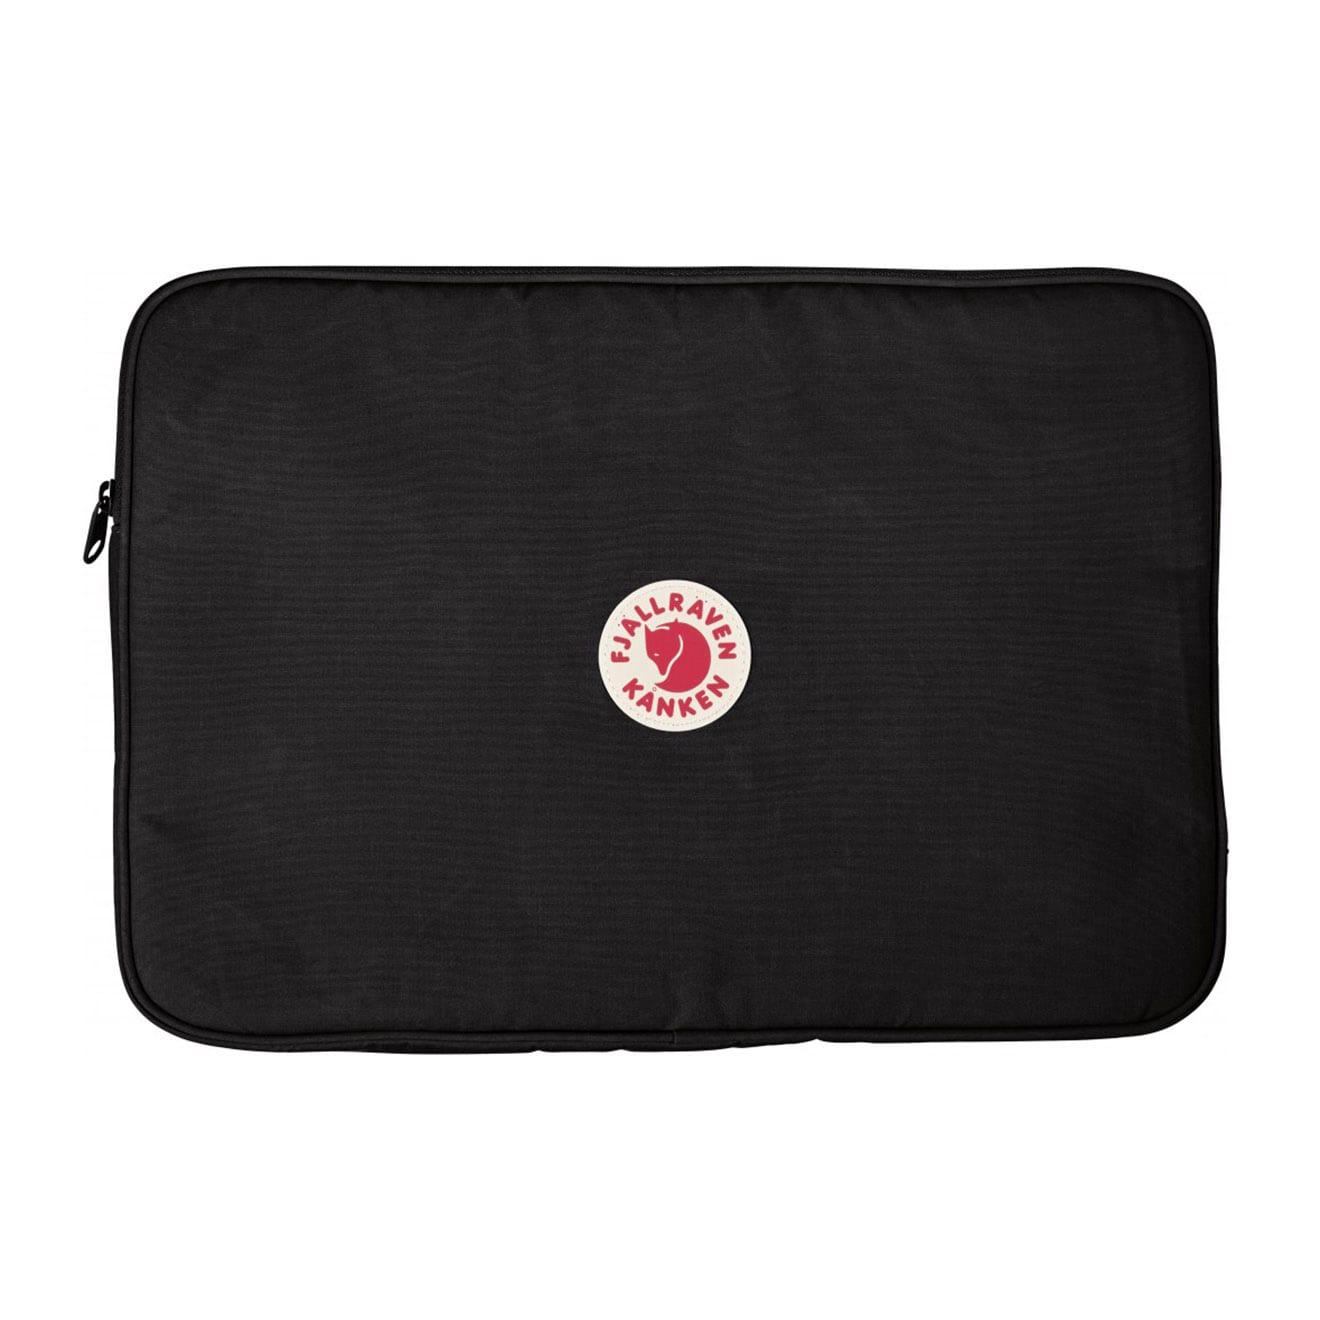 "Fjallraven Kanken 15"" Laptop Case Black"